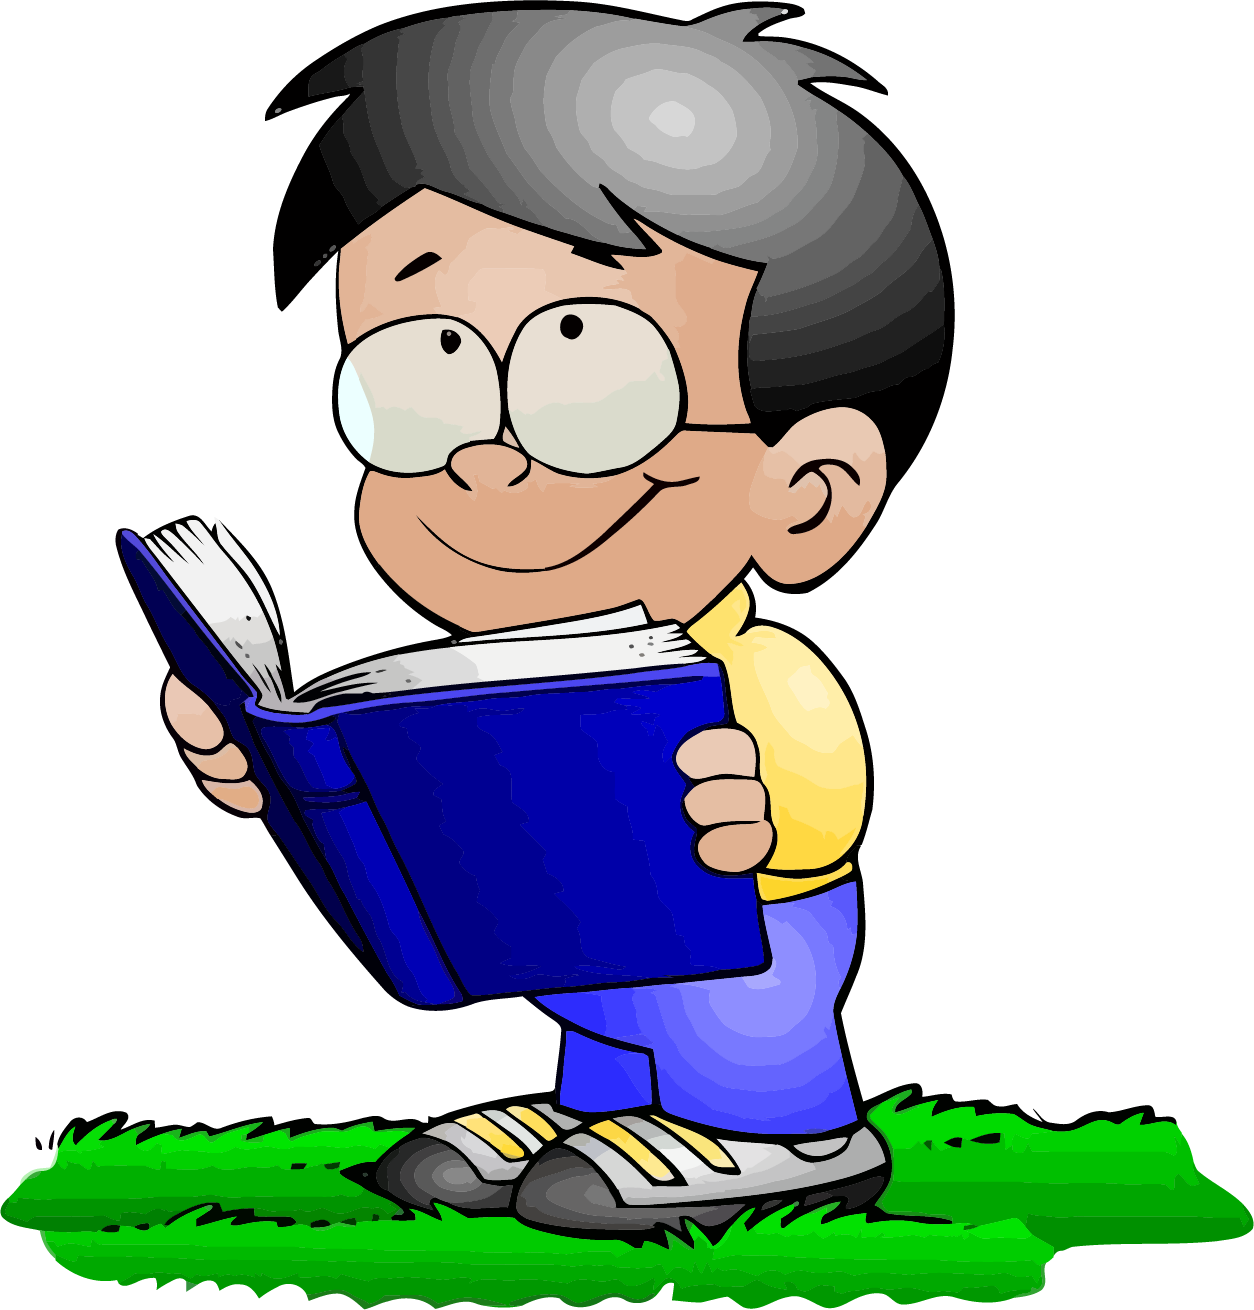 Clipart reading abook. Read a book boy